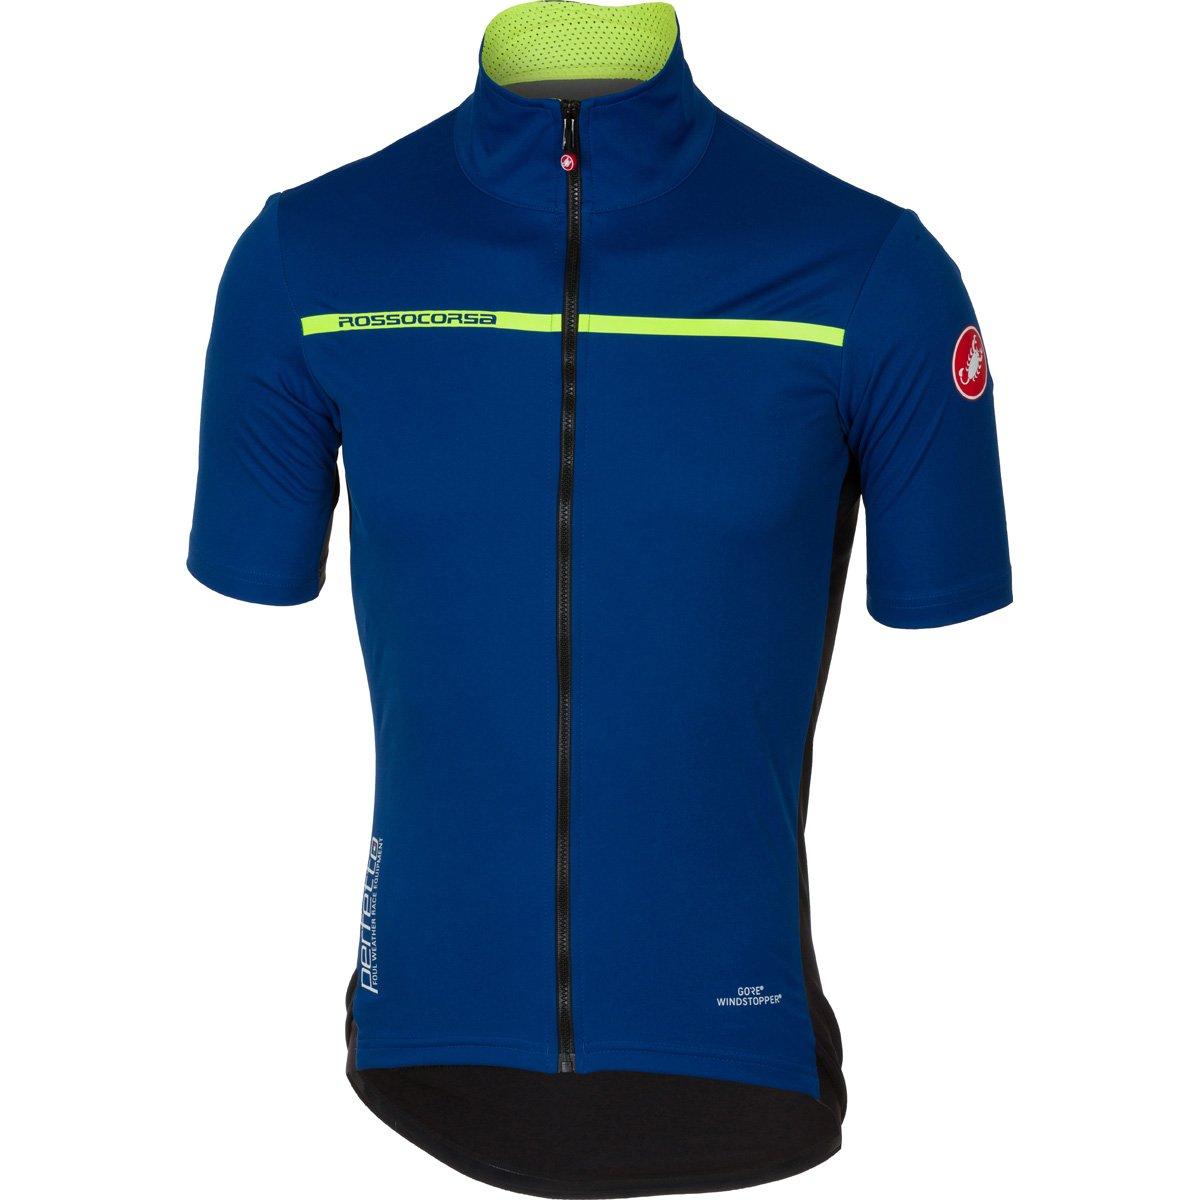 Castelli 2017 メンズ Perfetto 軽量半袖サイクリングジャケット B17085 B075ZM94B4 Medium|セラミックブルー セラミックブルー Medium